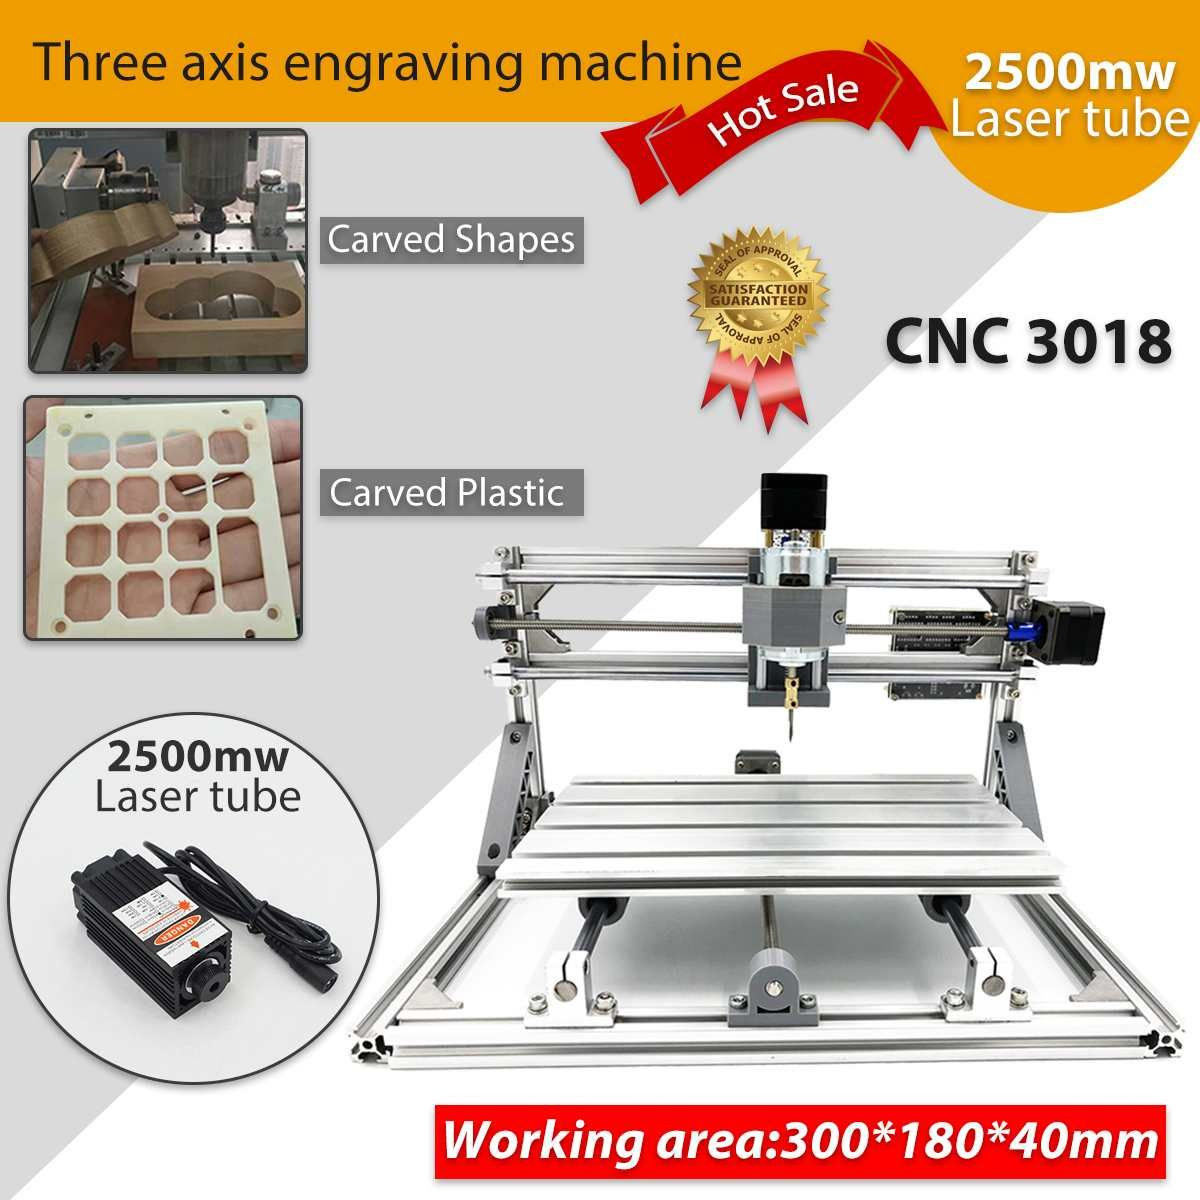 CNC DIY 3018 Holz Router KIt 3 Achse pcb Fräsmaschine Gravur Maschine 2500 mw